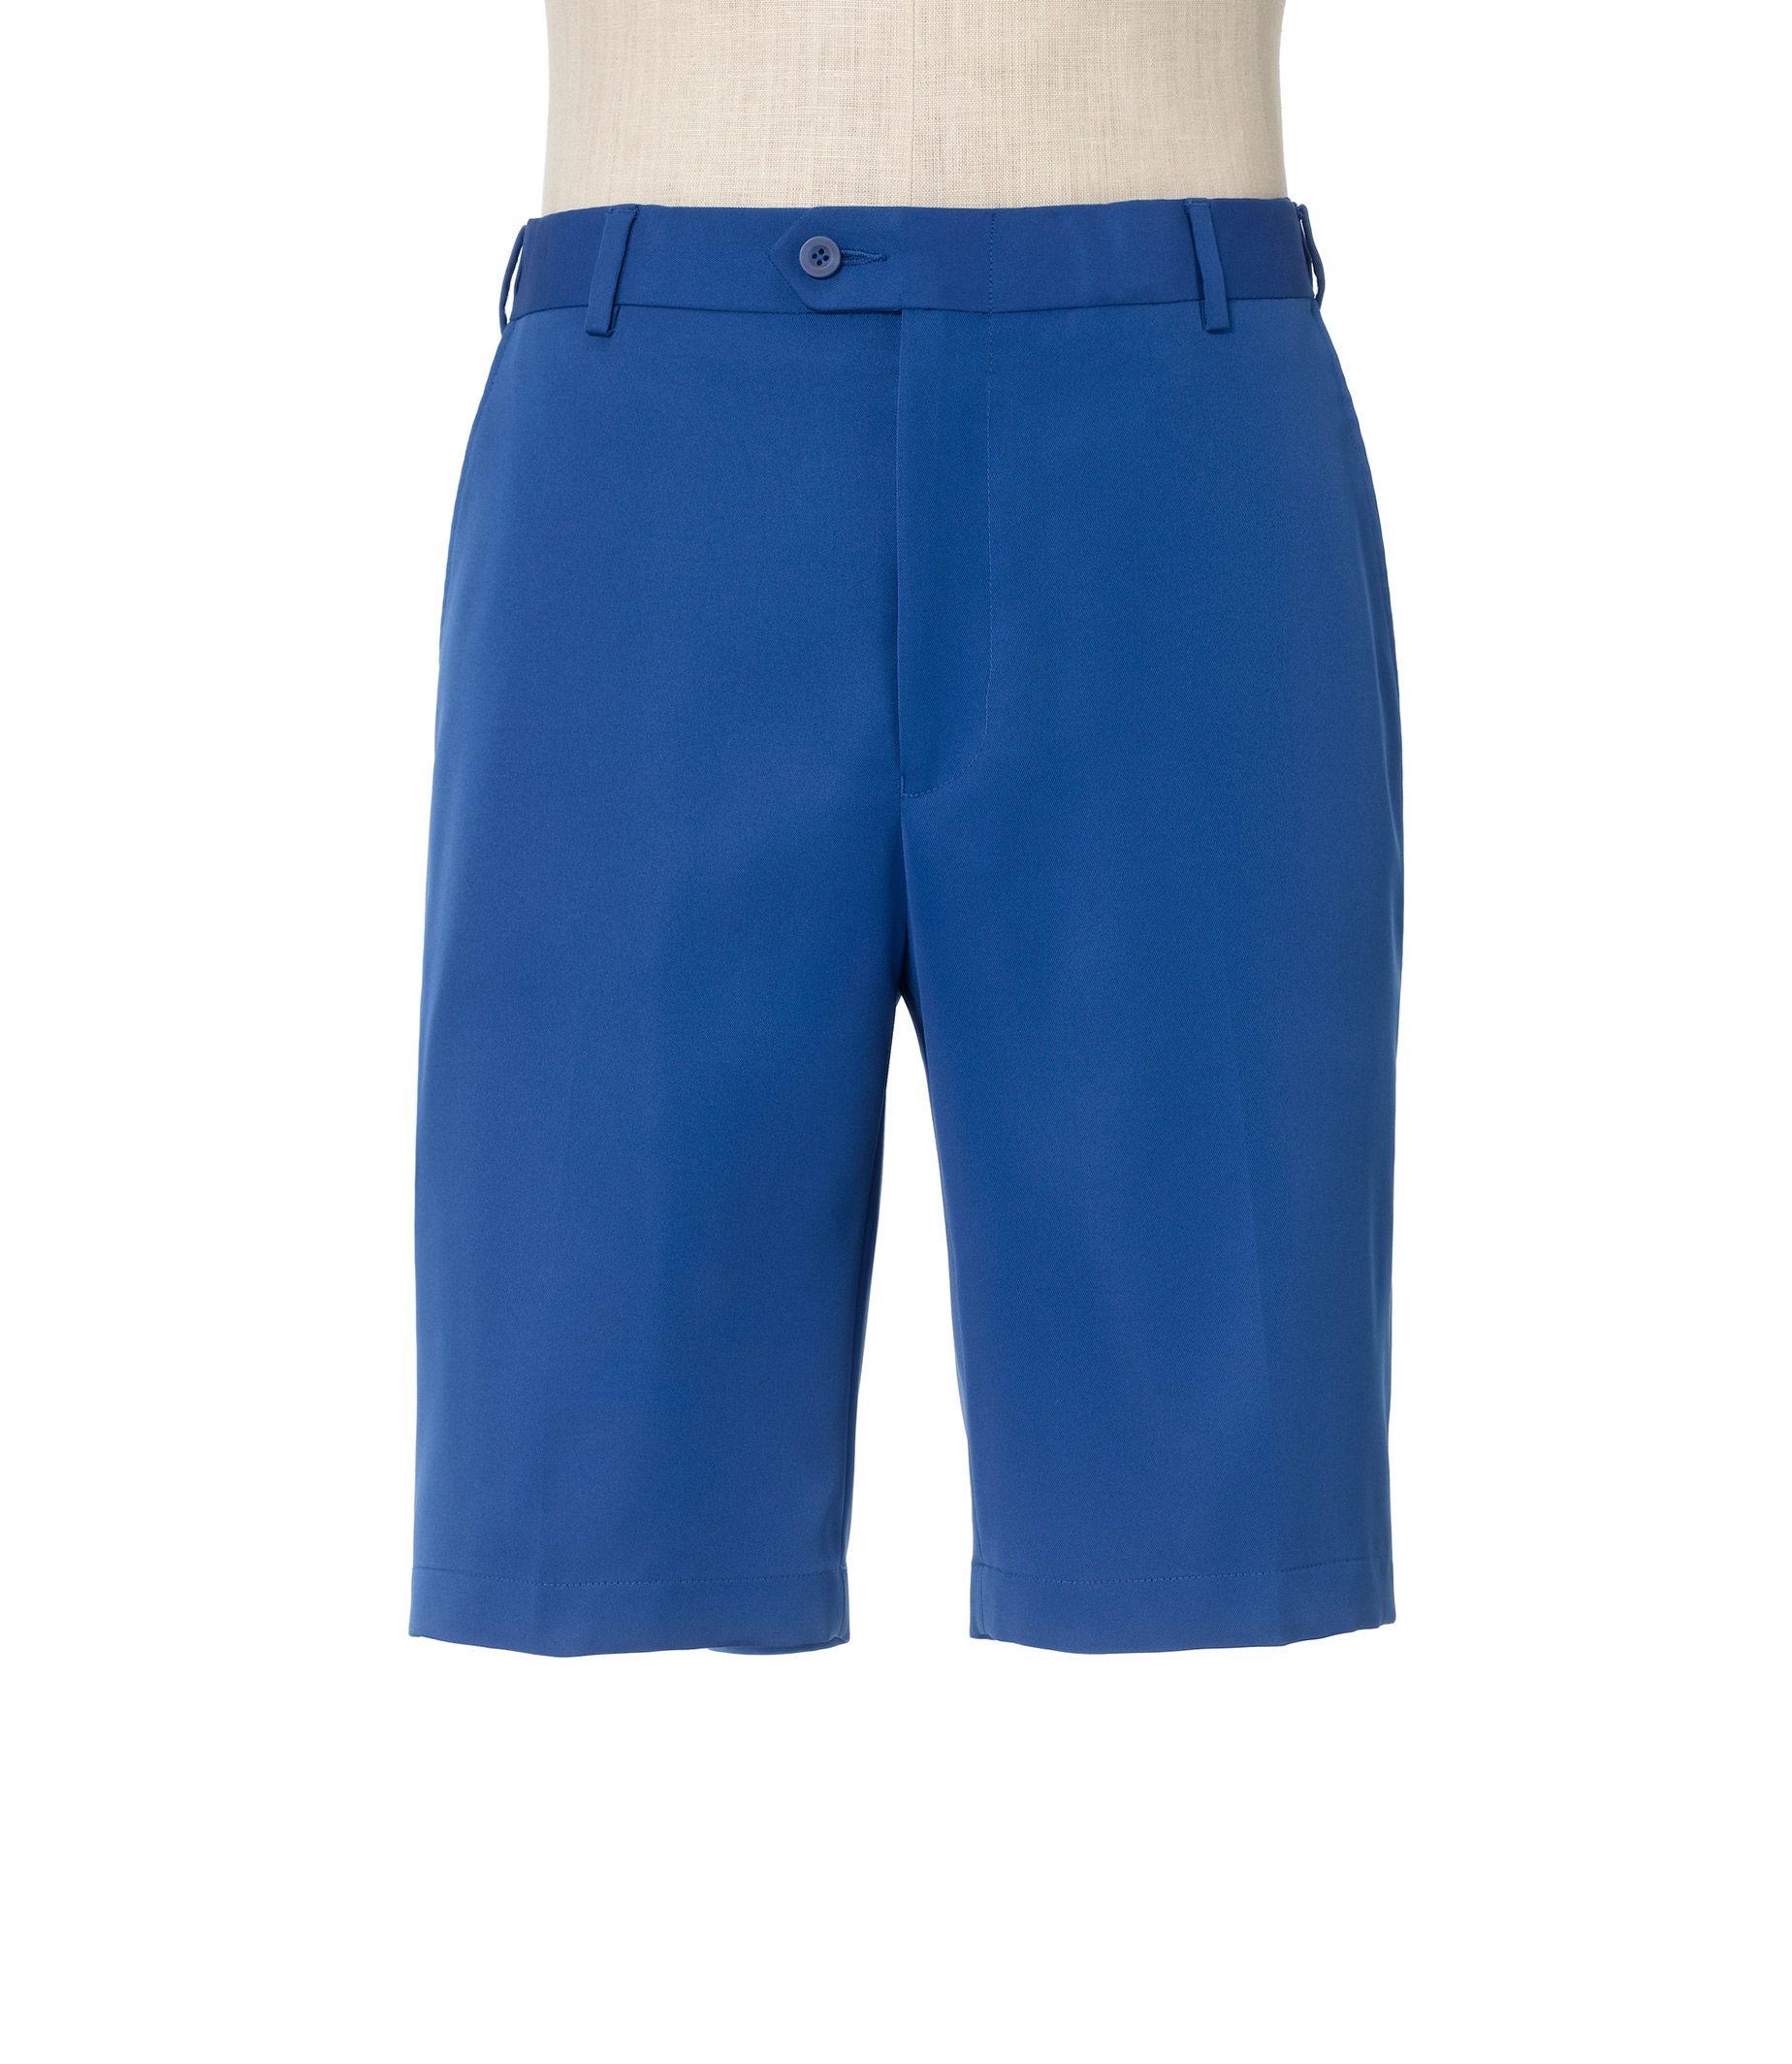 David Leadbetter Slider Shorts